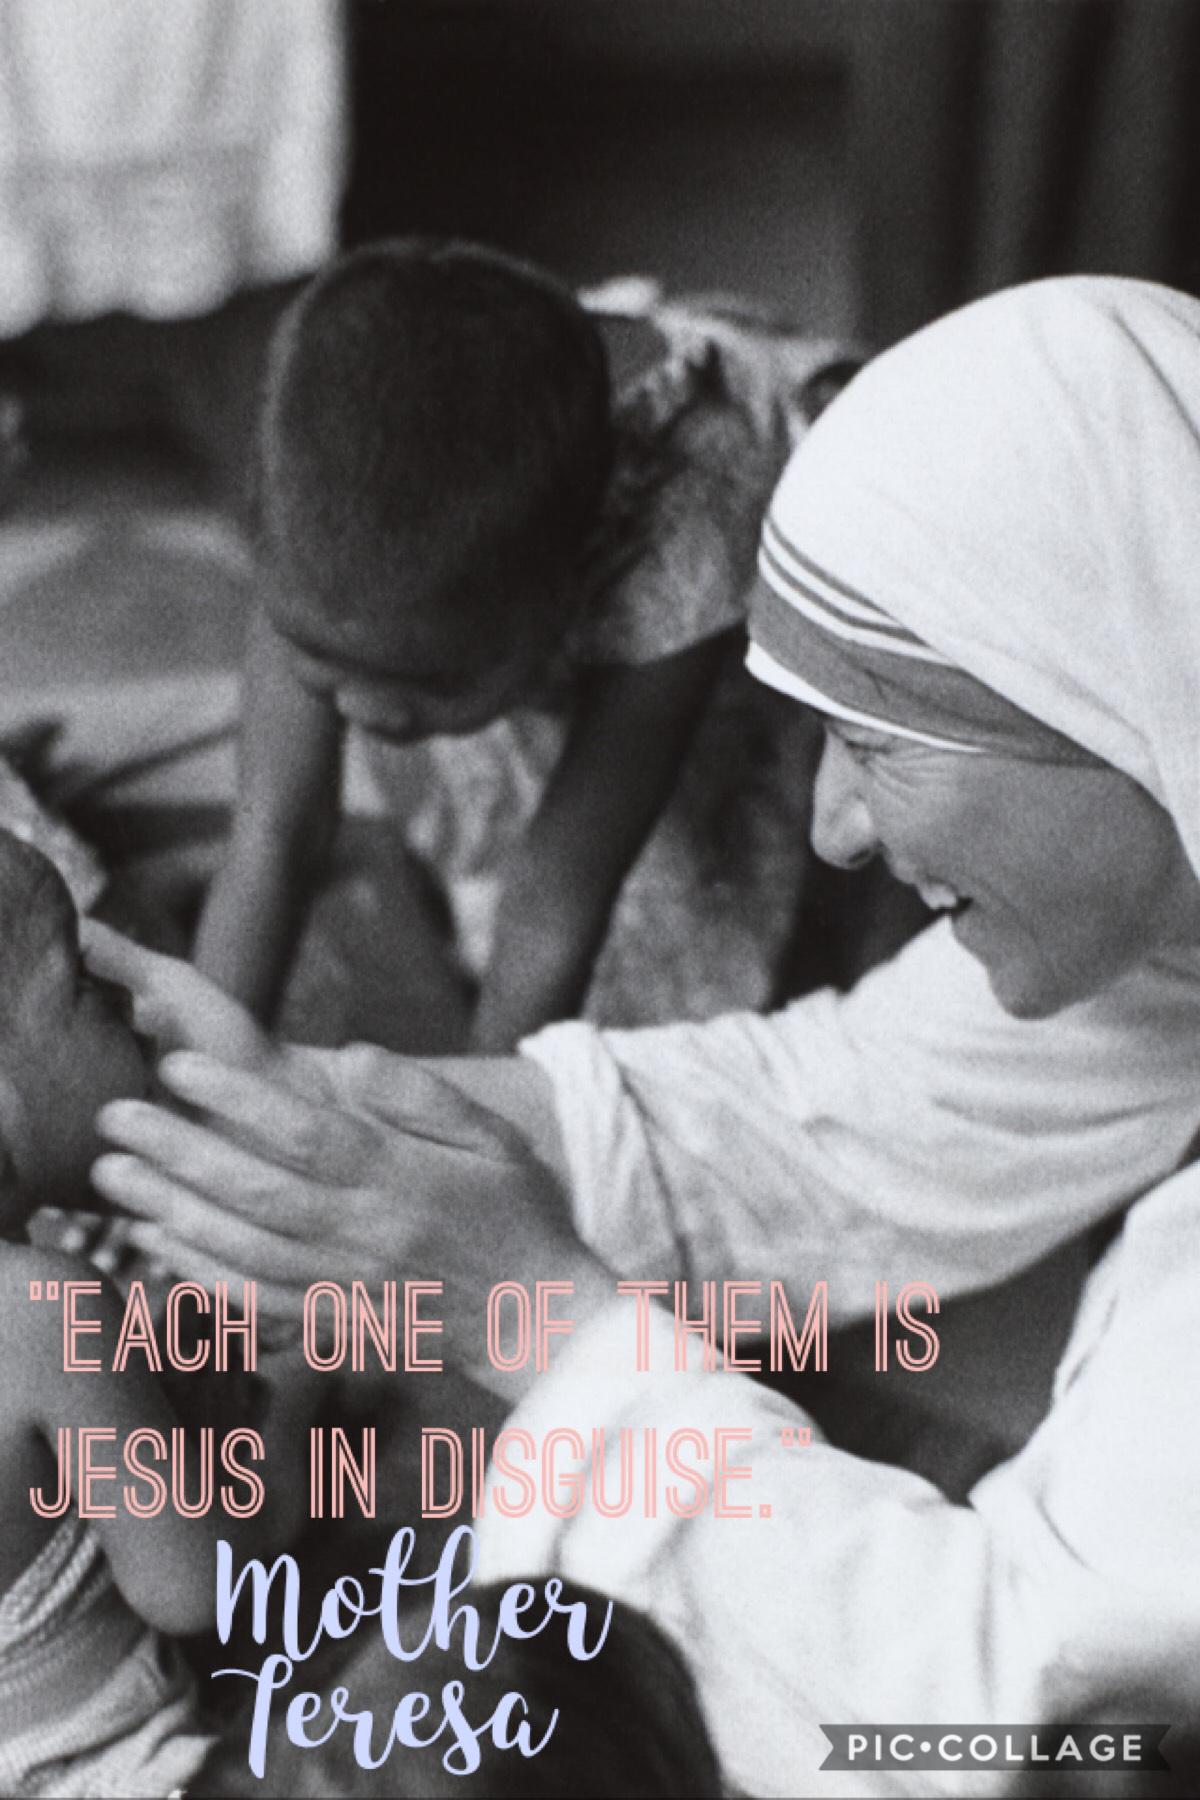 ❤️ Mother Teresa ❤️